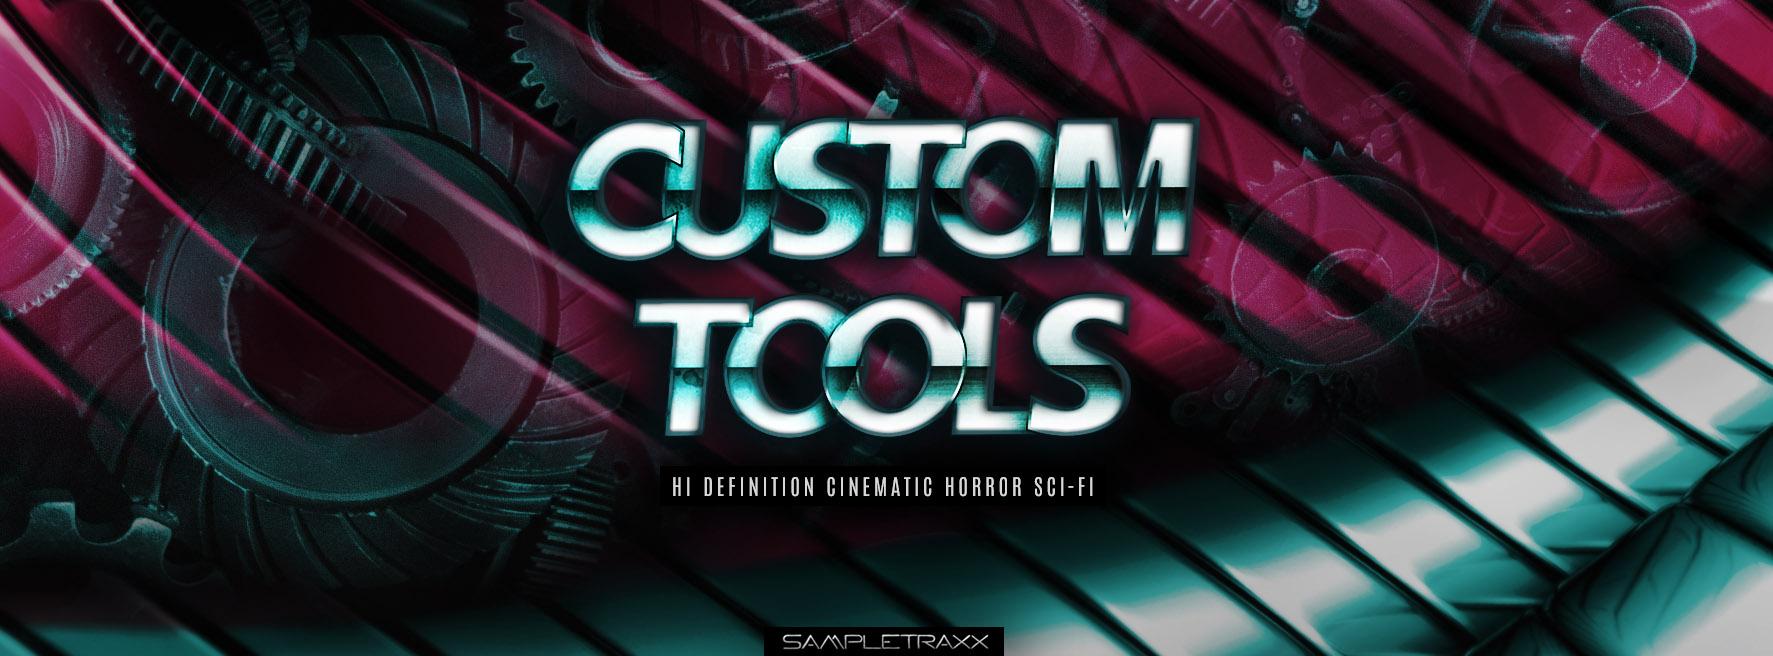 CUSTOM TOOLS - SampleTraxx